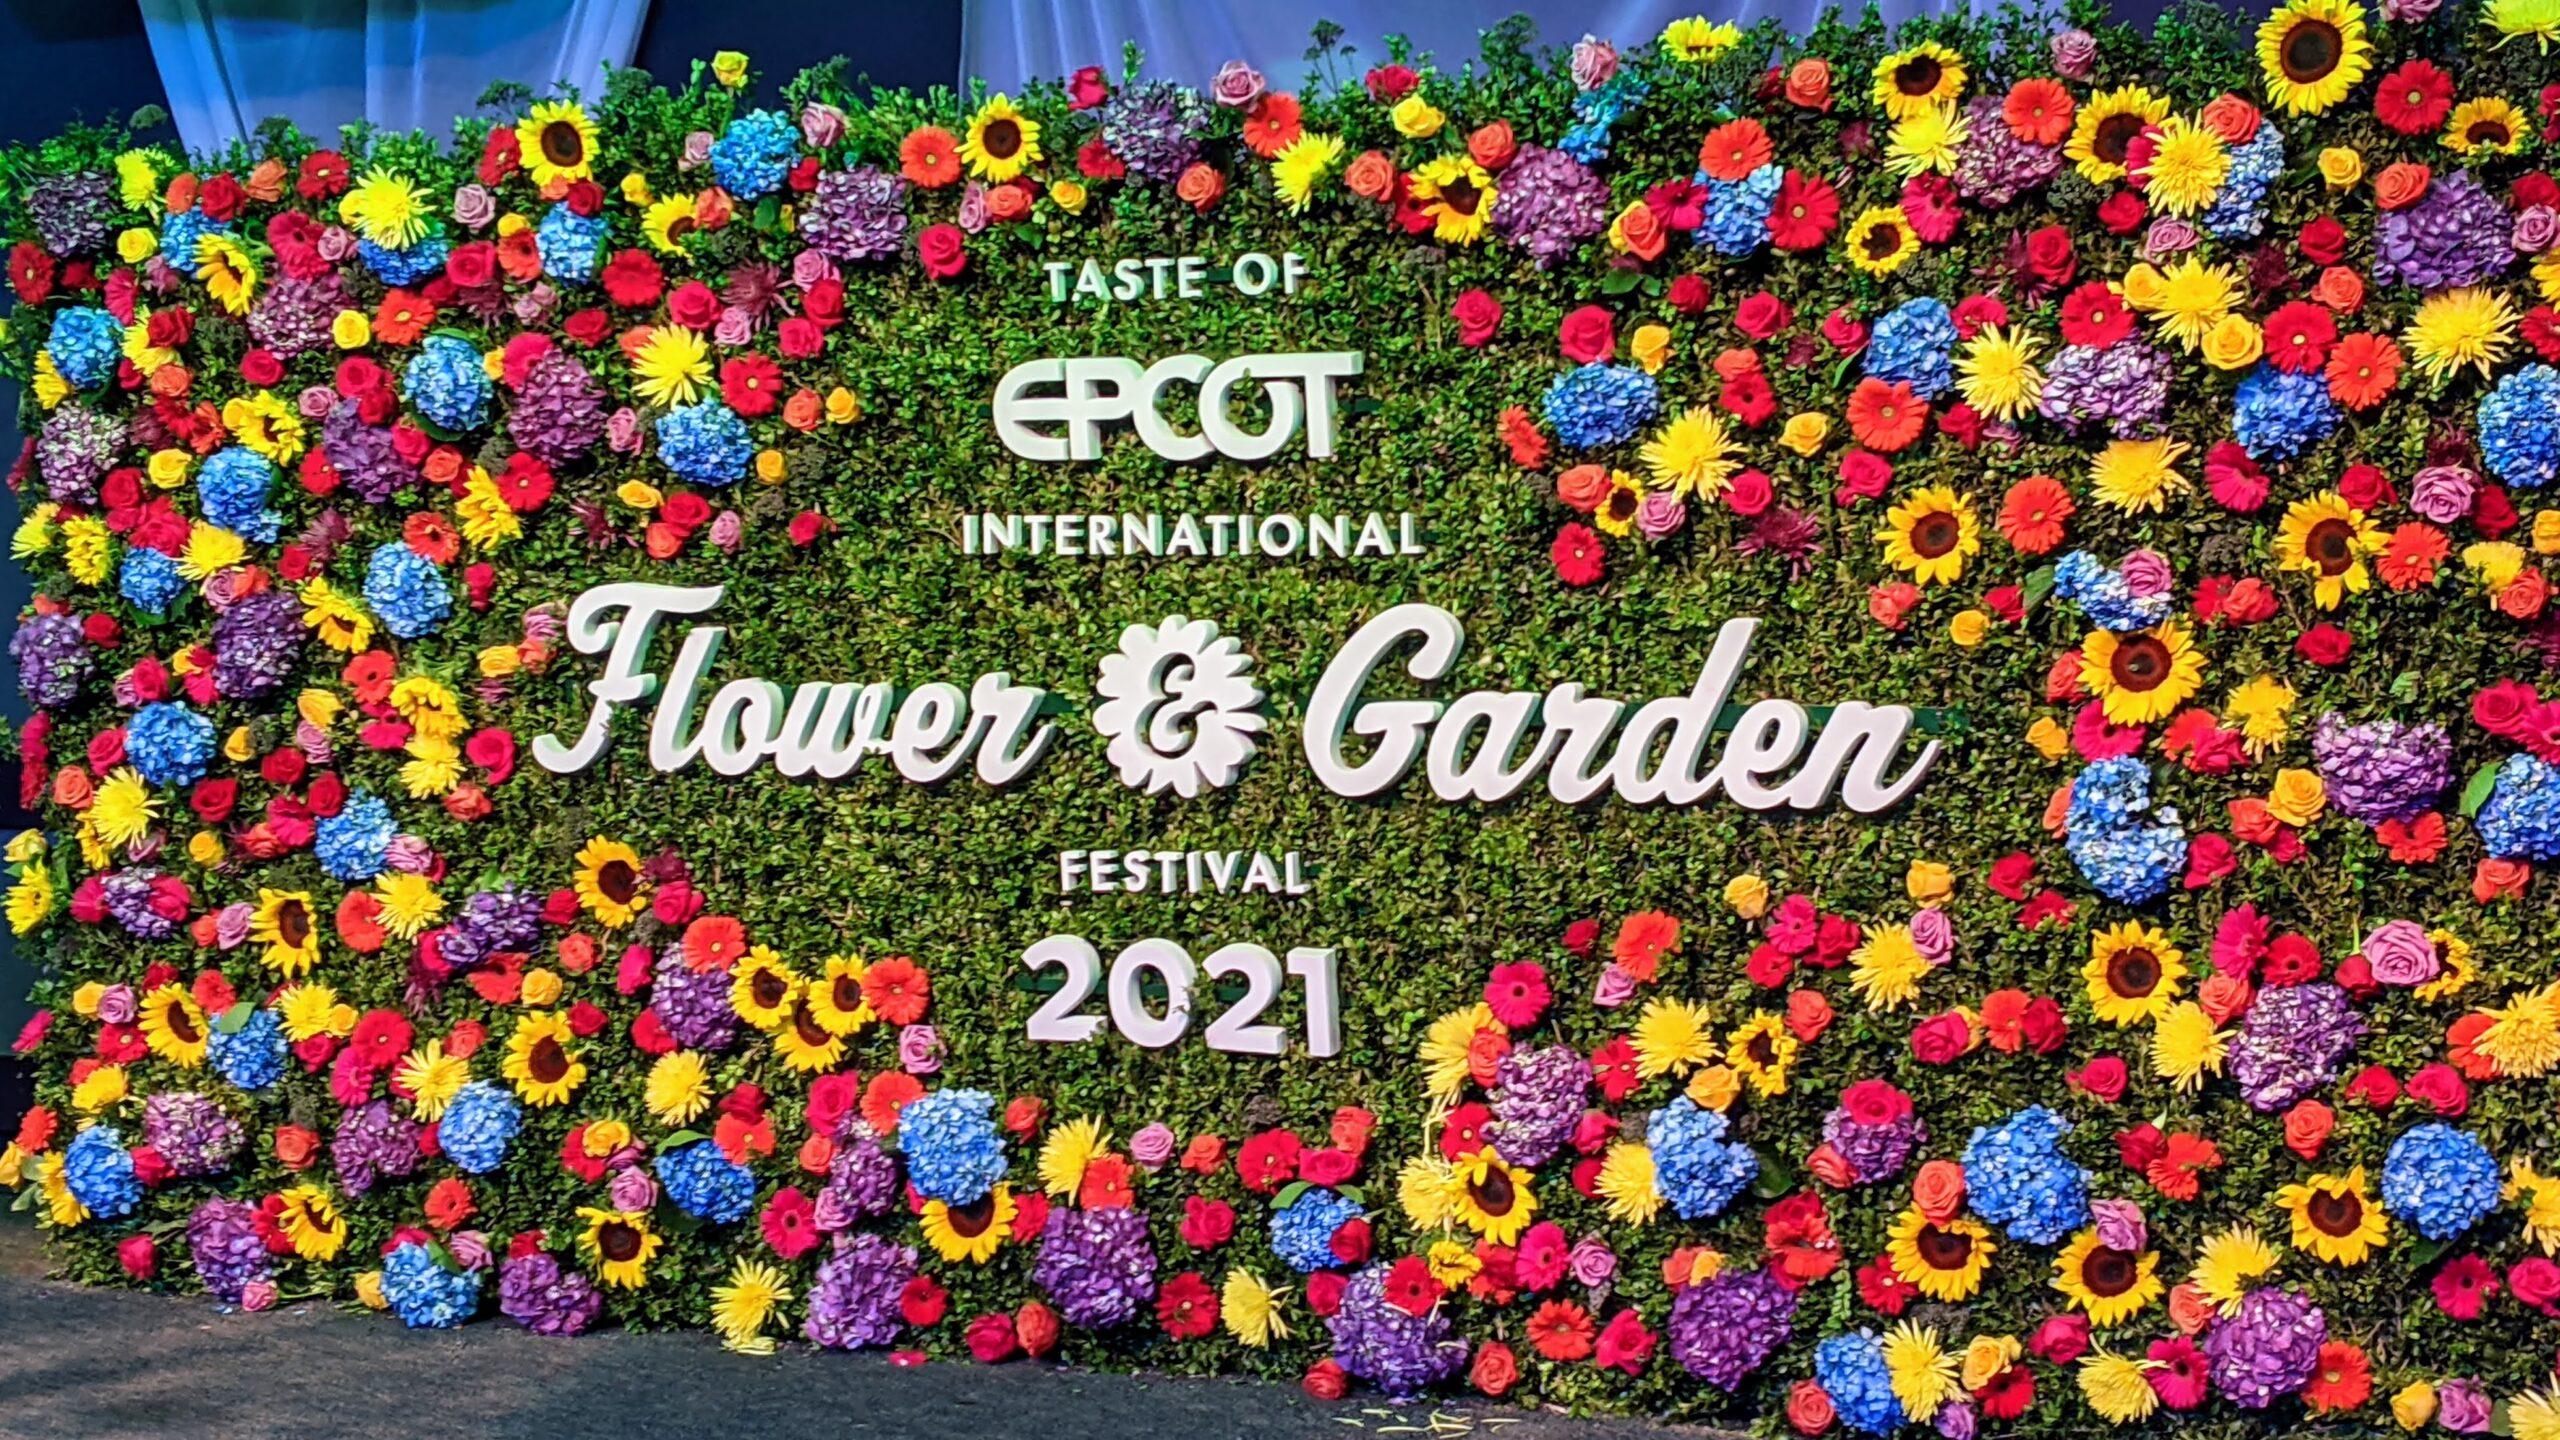 Epcot's Flower & Garden Festival 2021 Overview